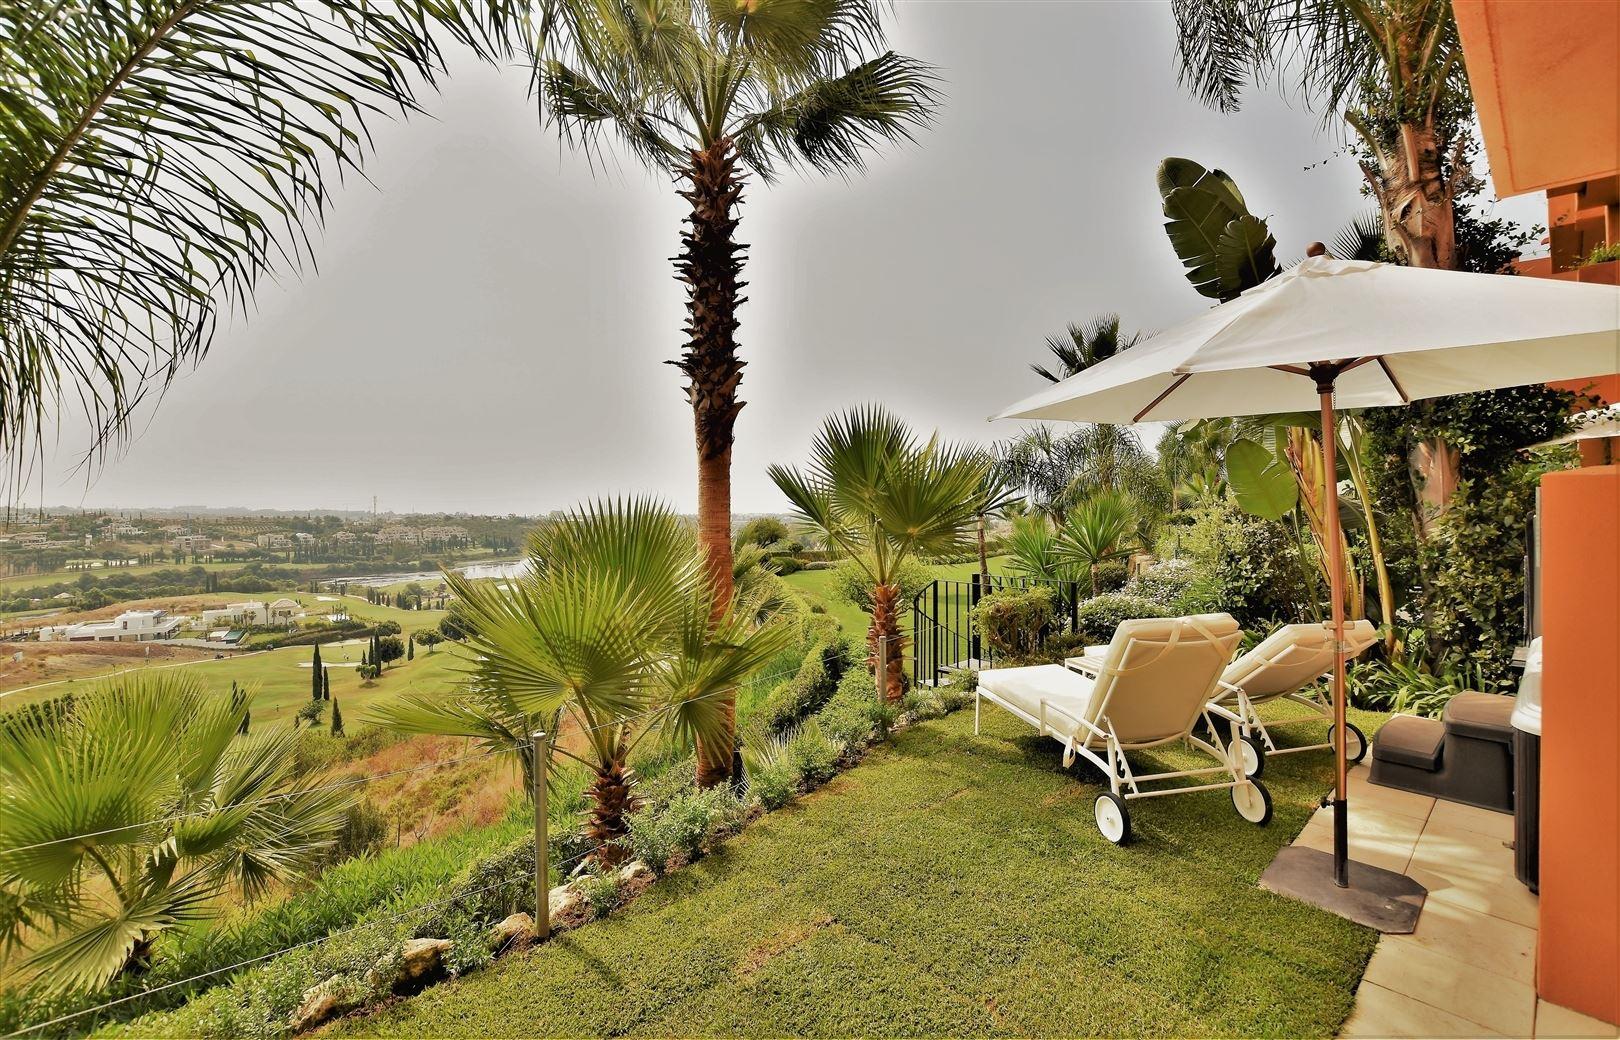 Foto 30 : Appartement te 29679 MARBELLA (Spanje) - Prijs € 1.750